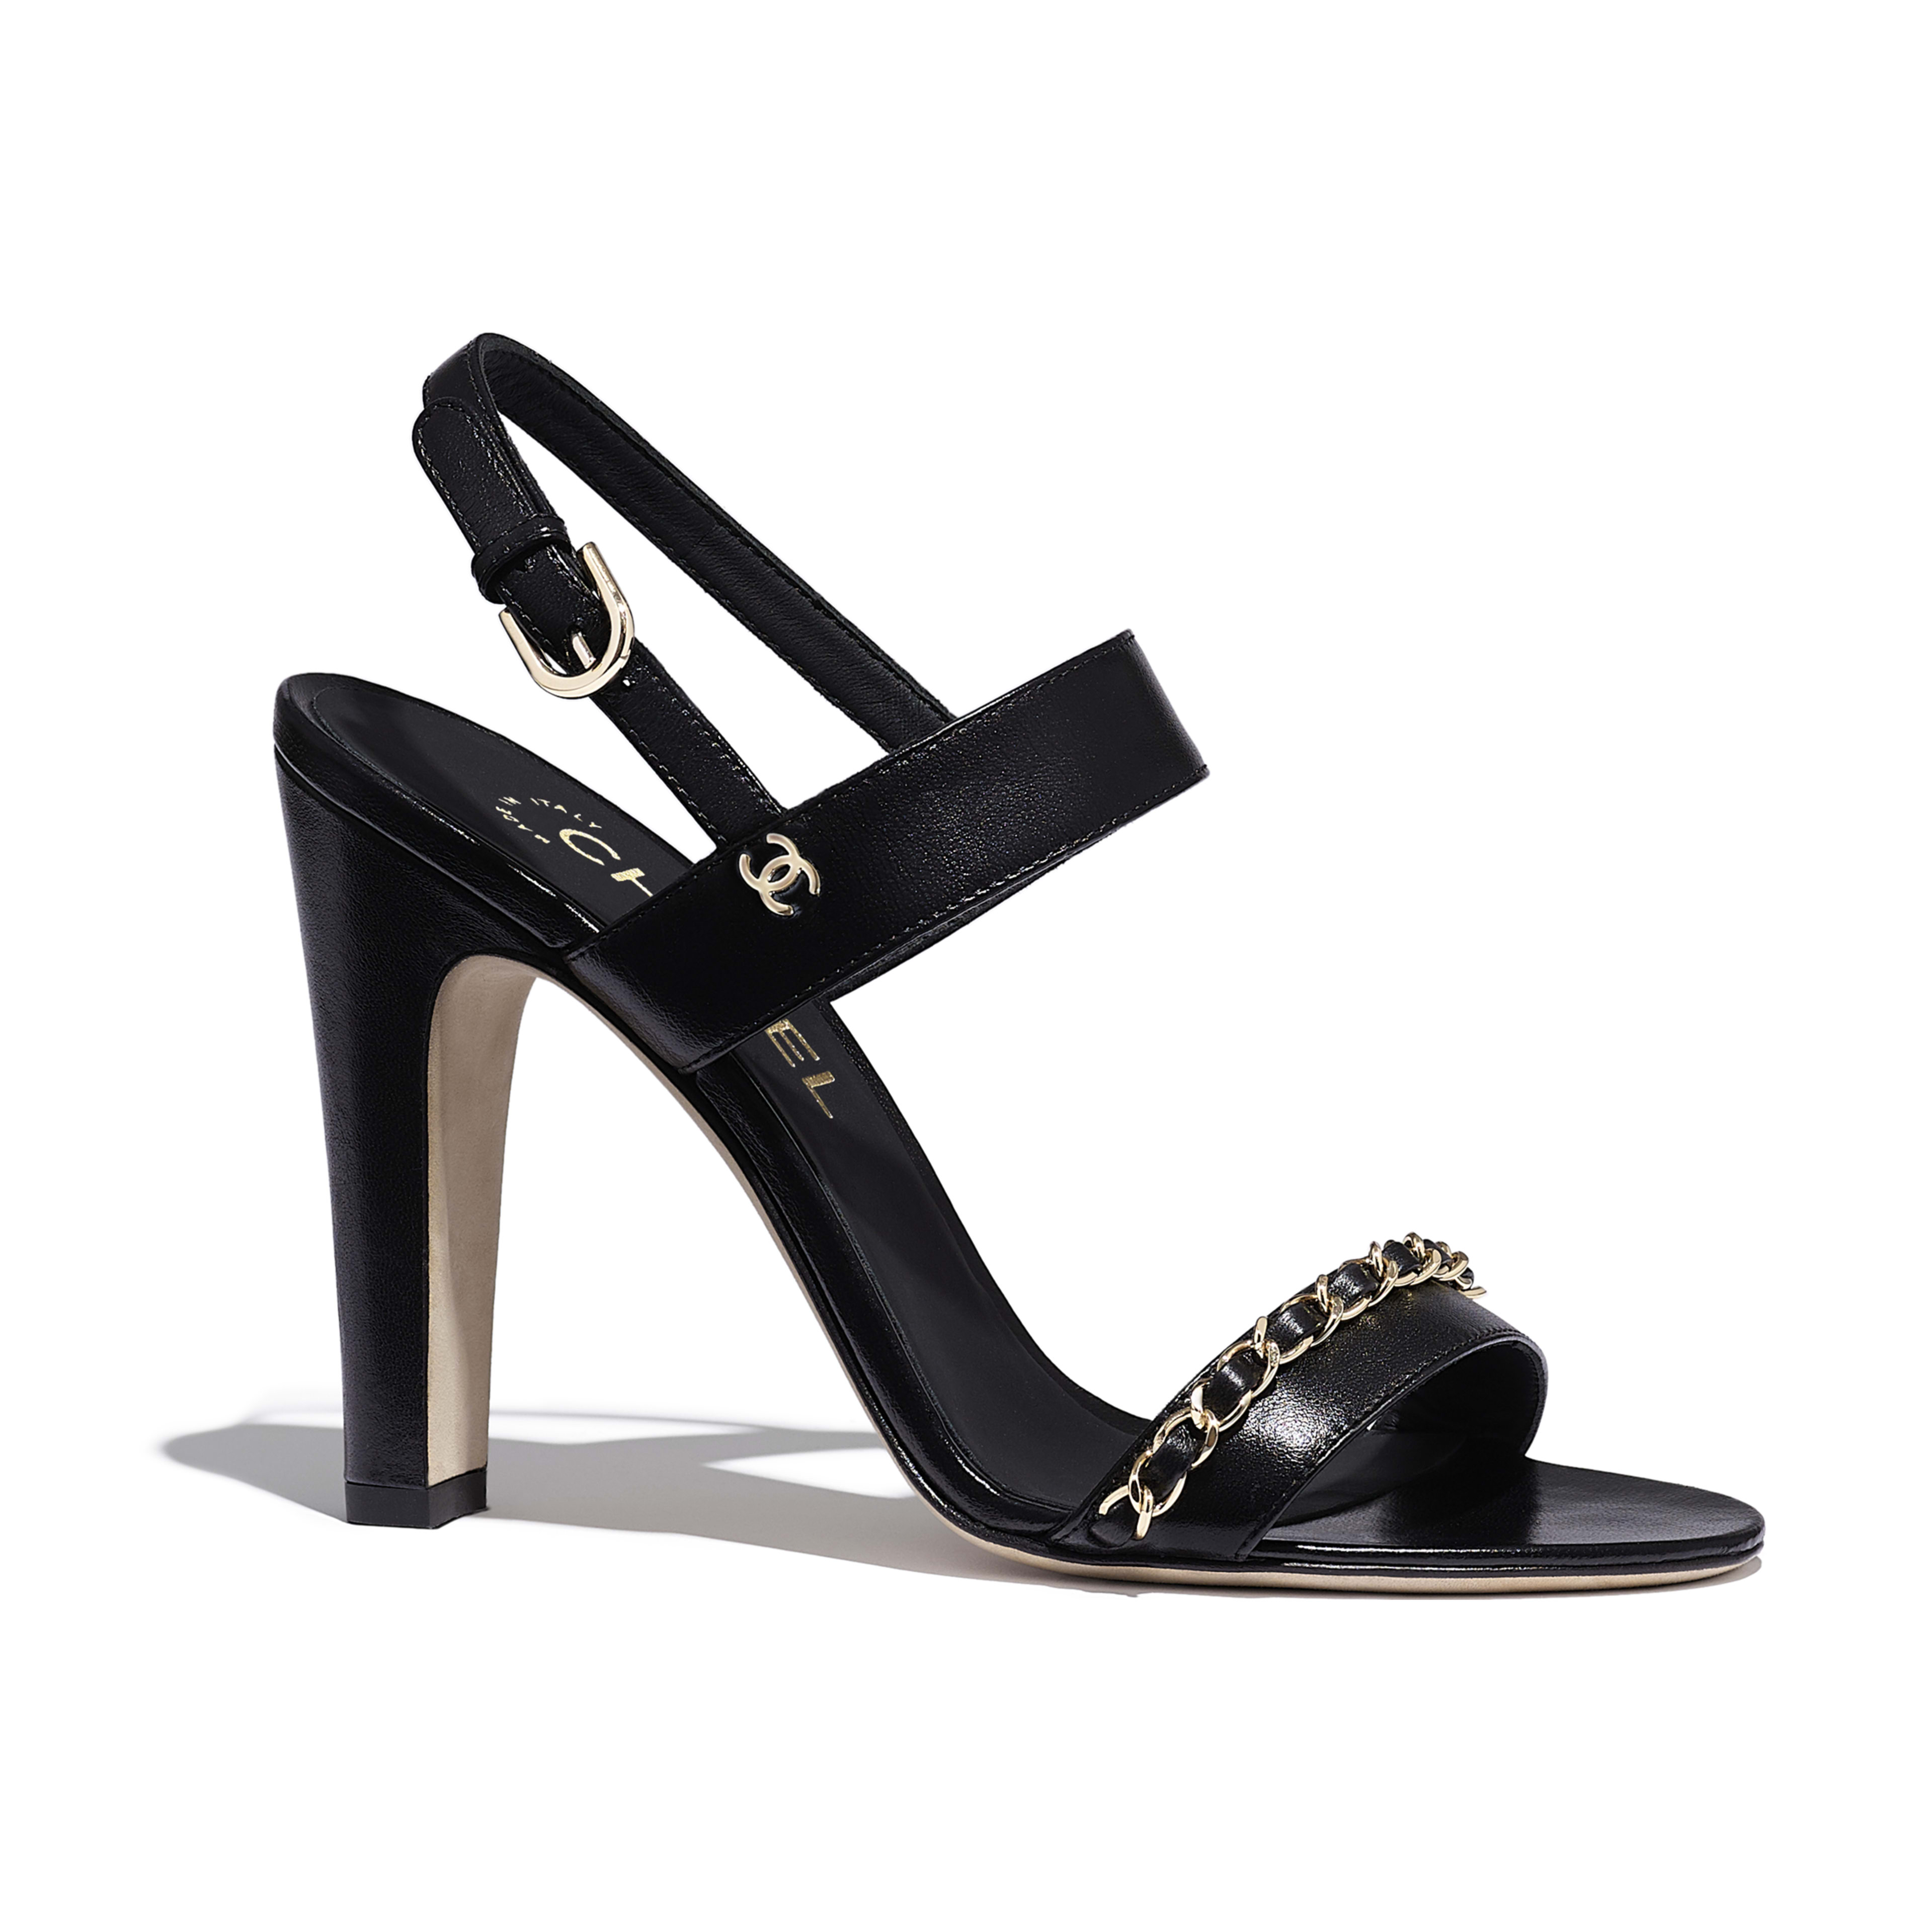 Sandals - Black - Lambskin - Default view - see full sized version